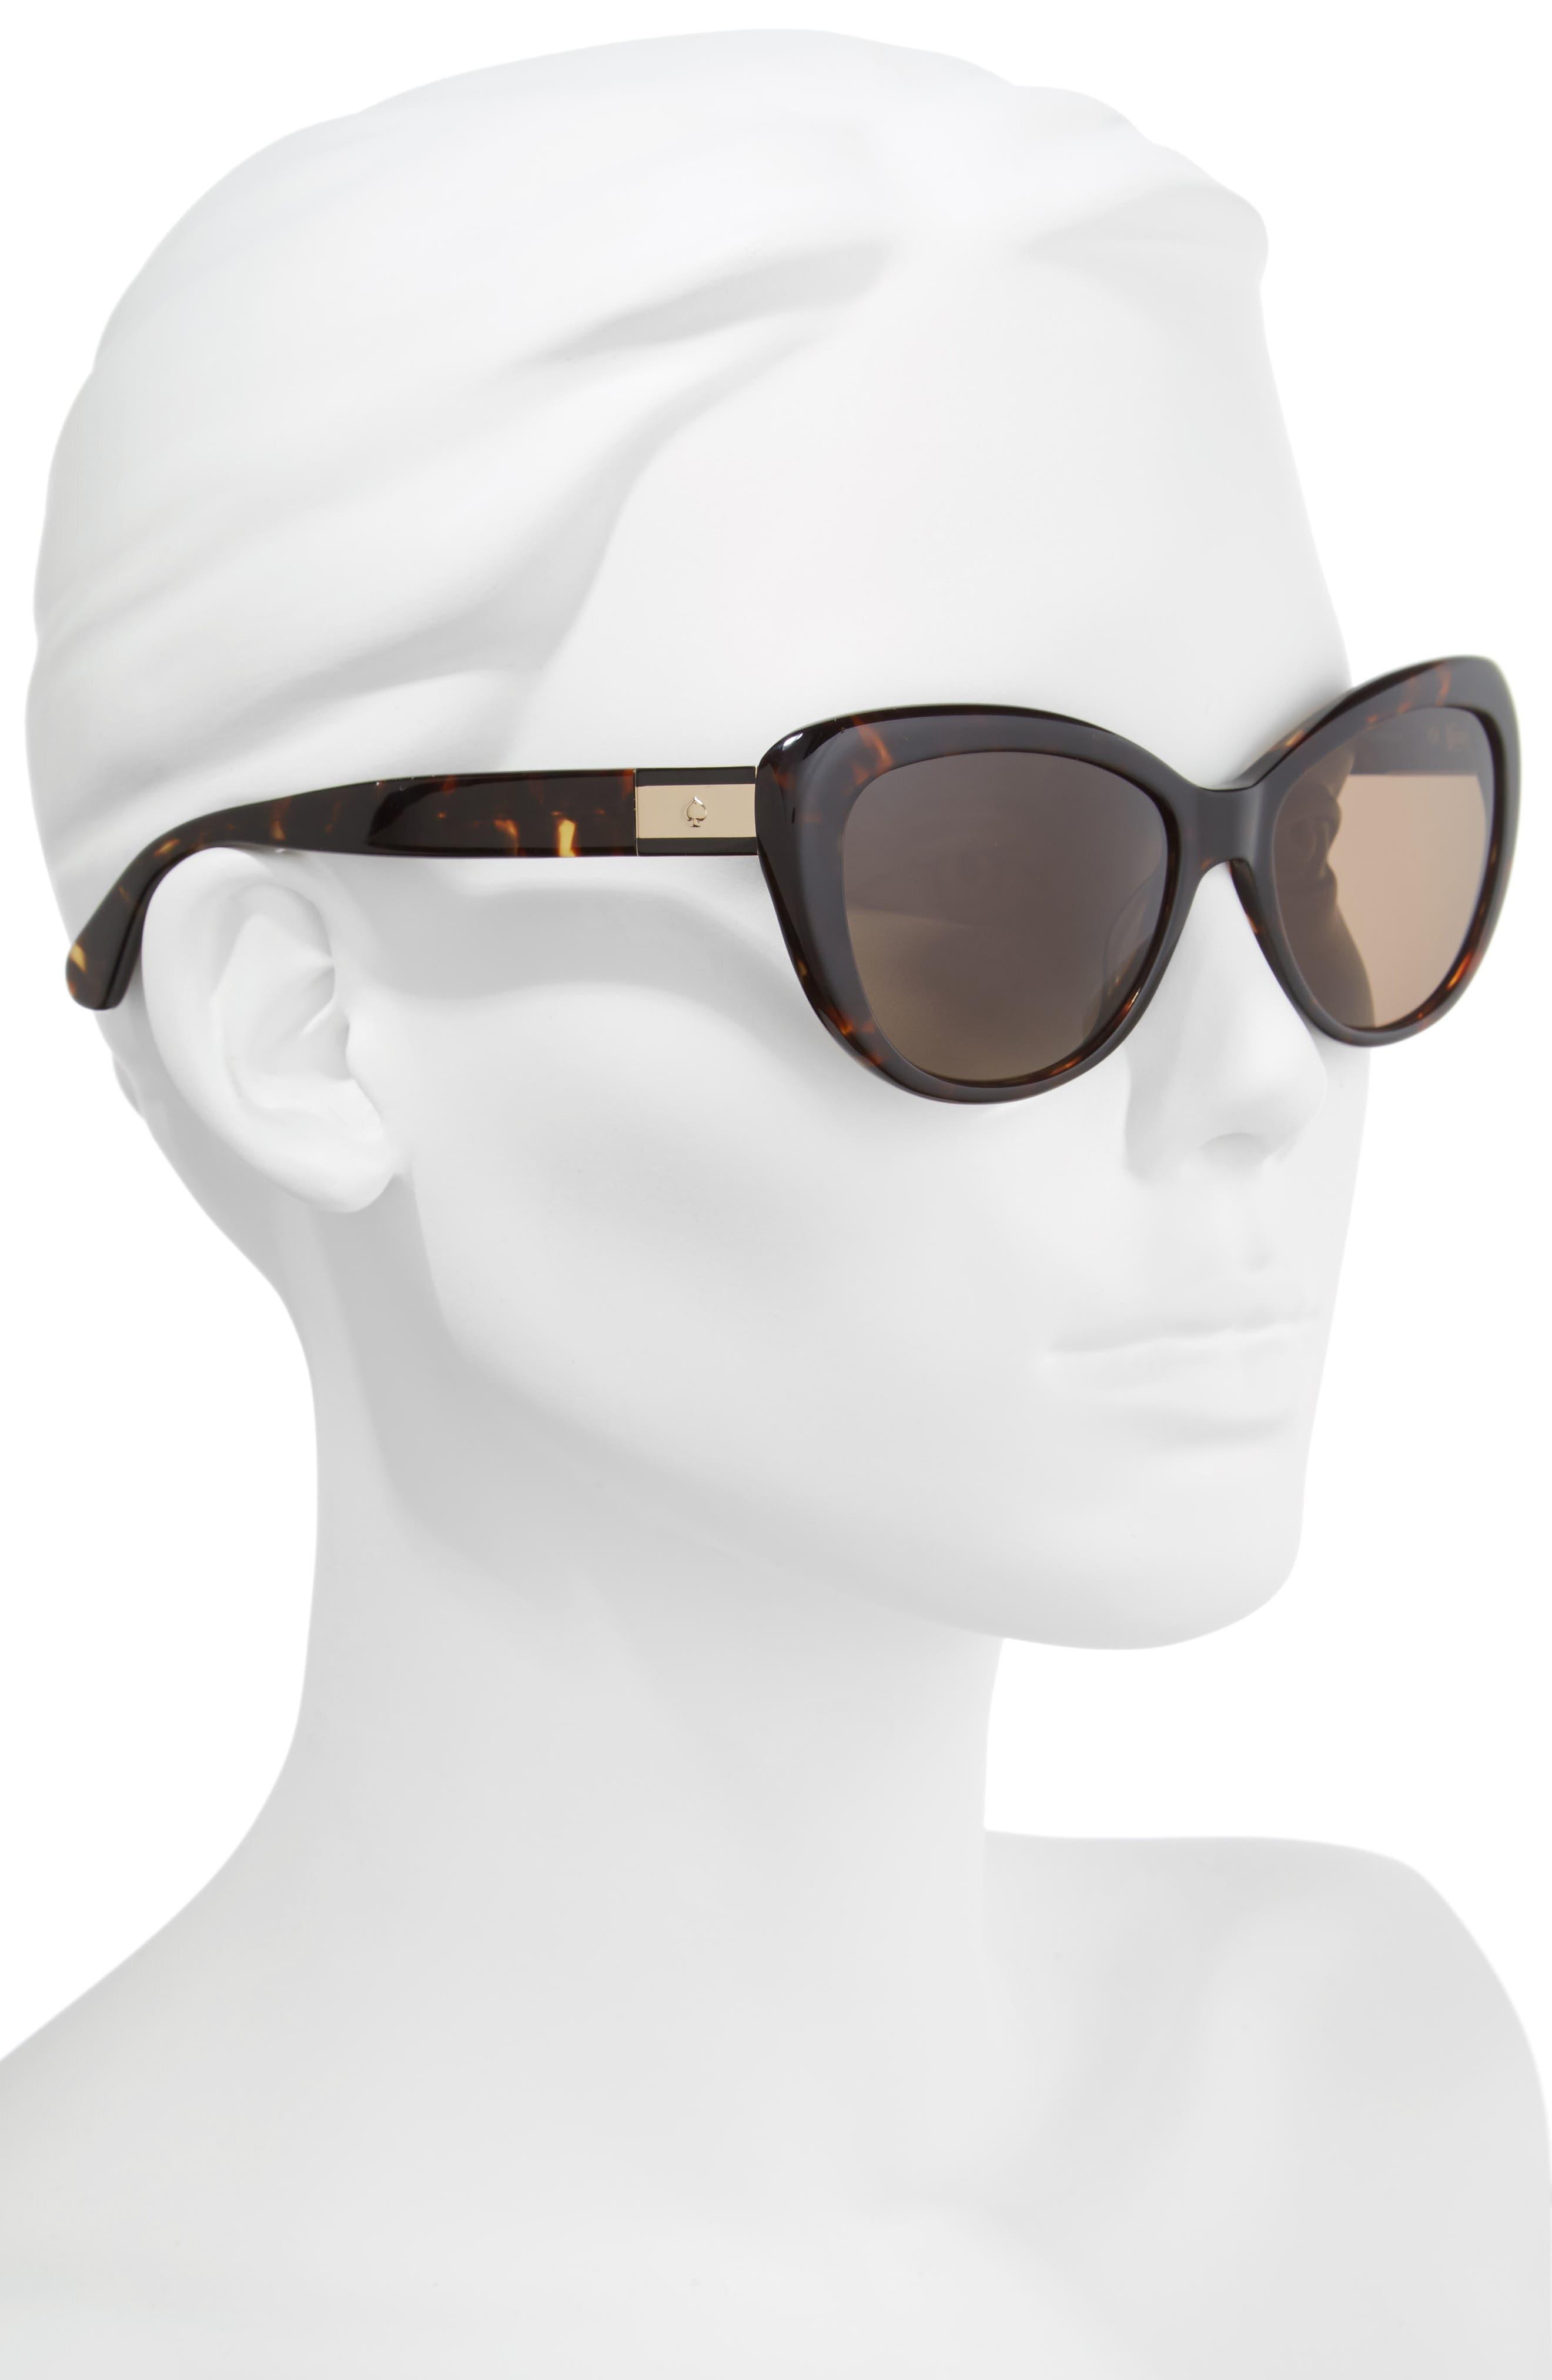 emmalynn 54mm polarized cat eye sunglasses,                             Alternate thumbnail 2, color,                             Dark Havana